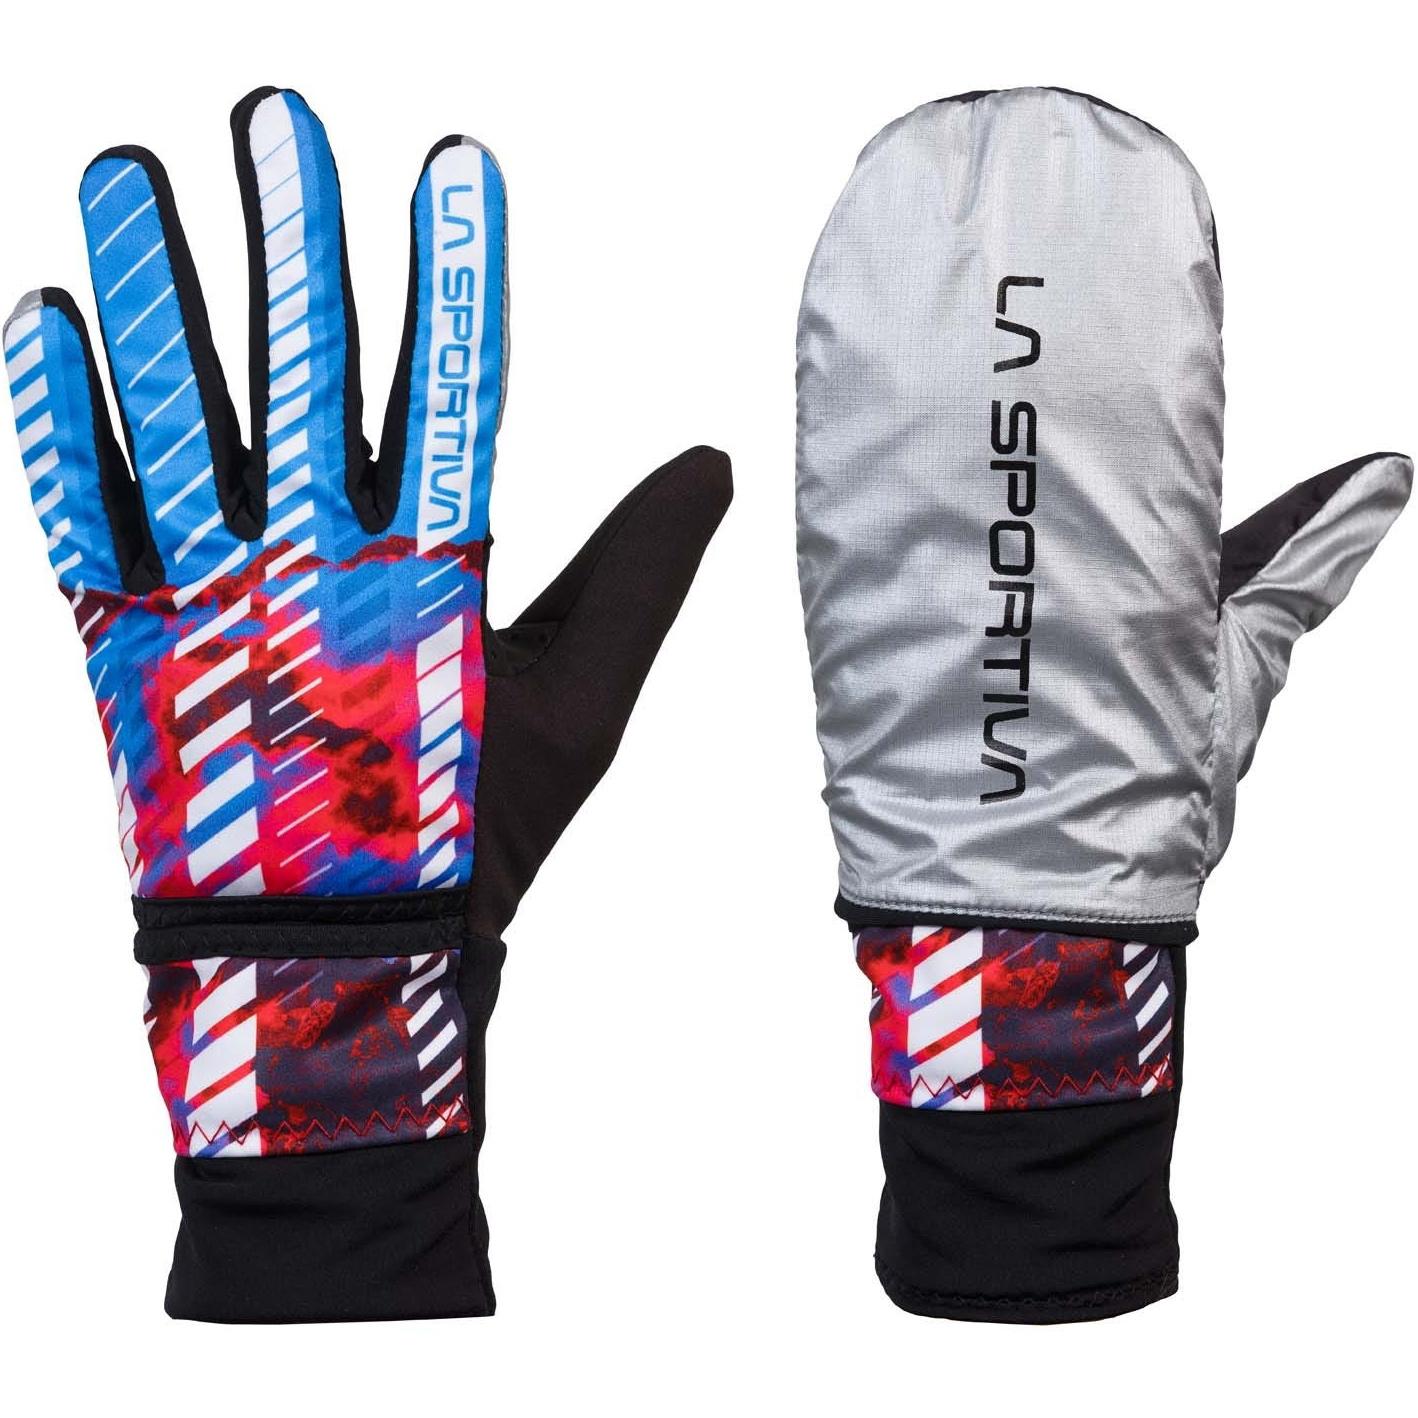 La Sportiva Winter Running Gloves Evo Women - Malibu Blue/Hibiscus